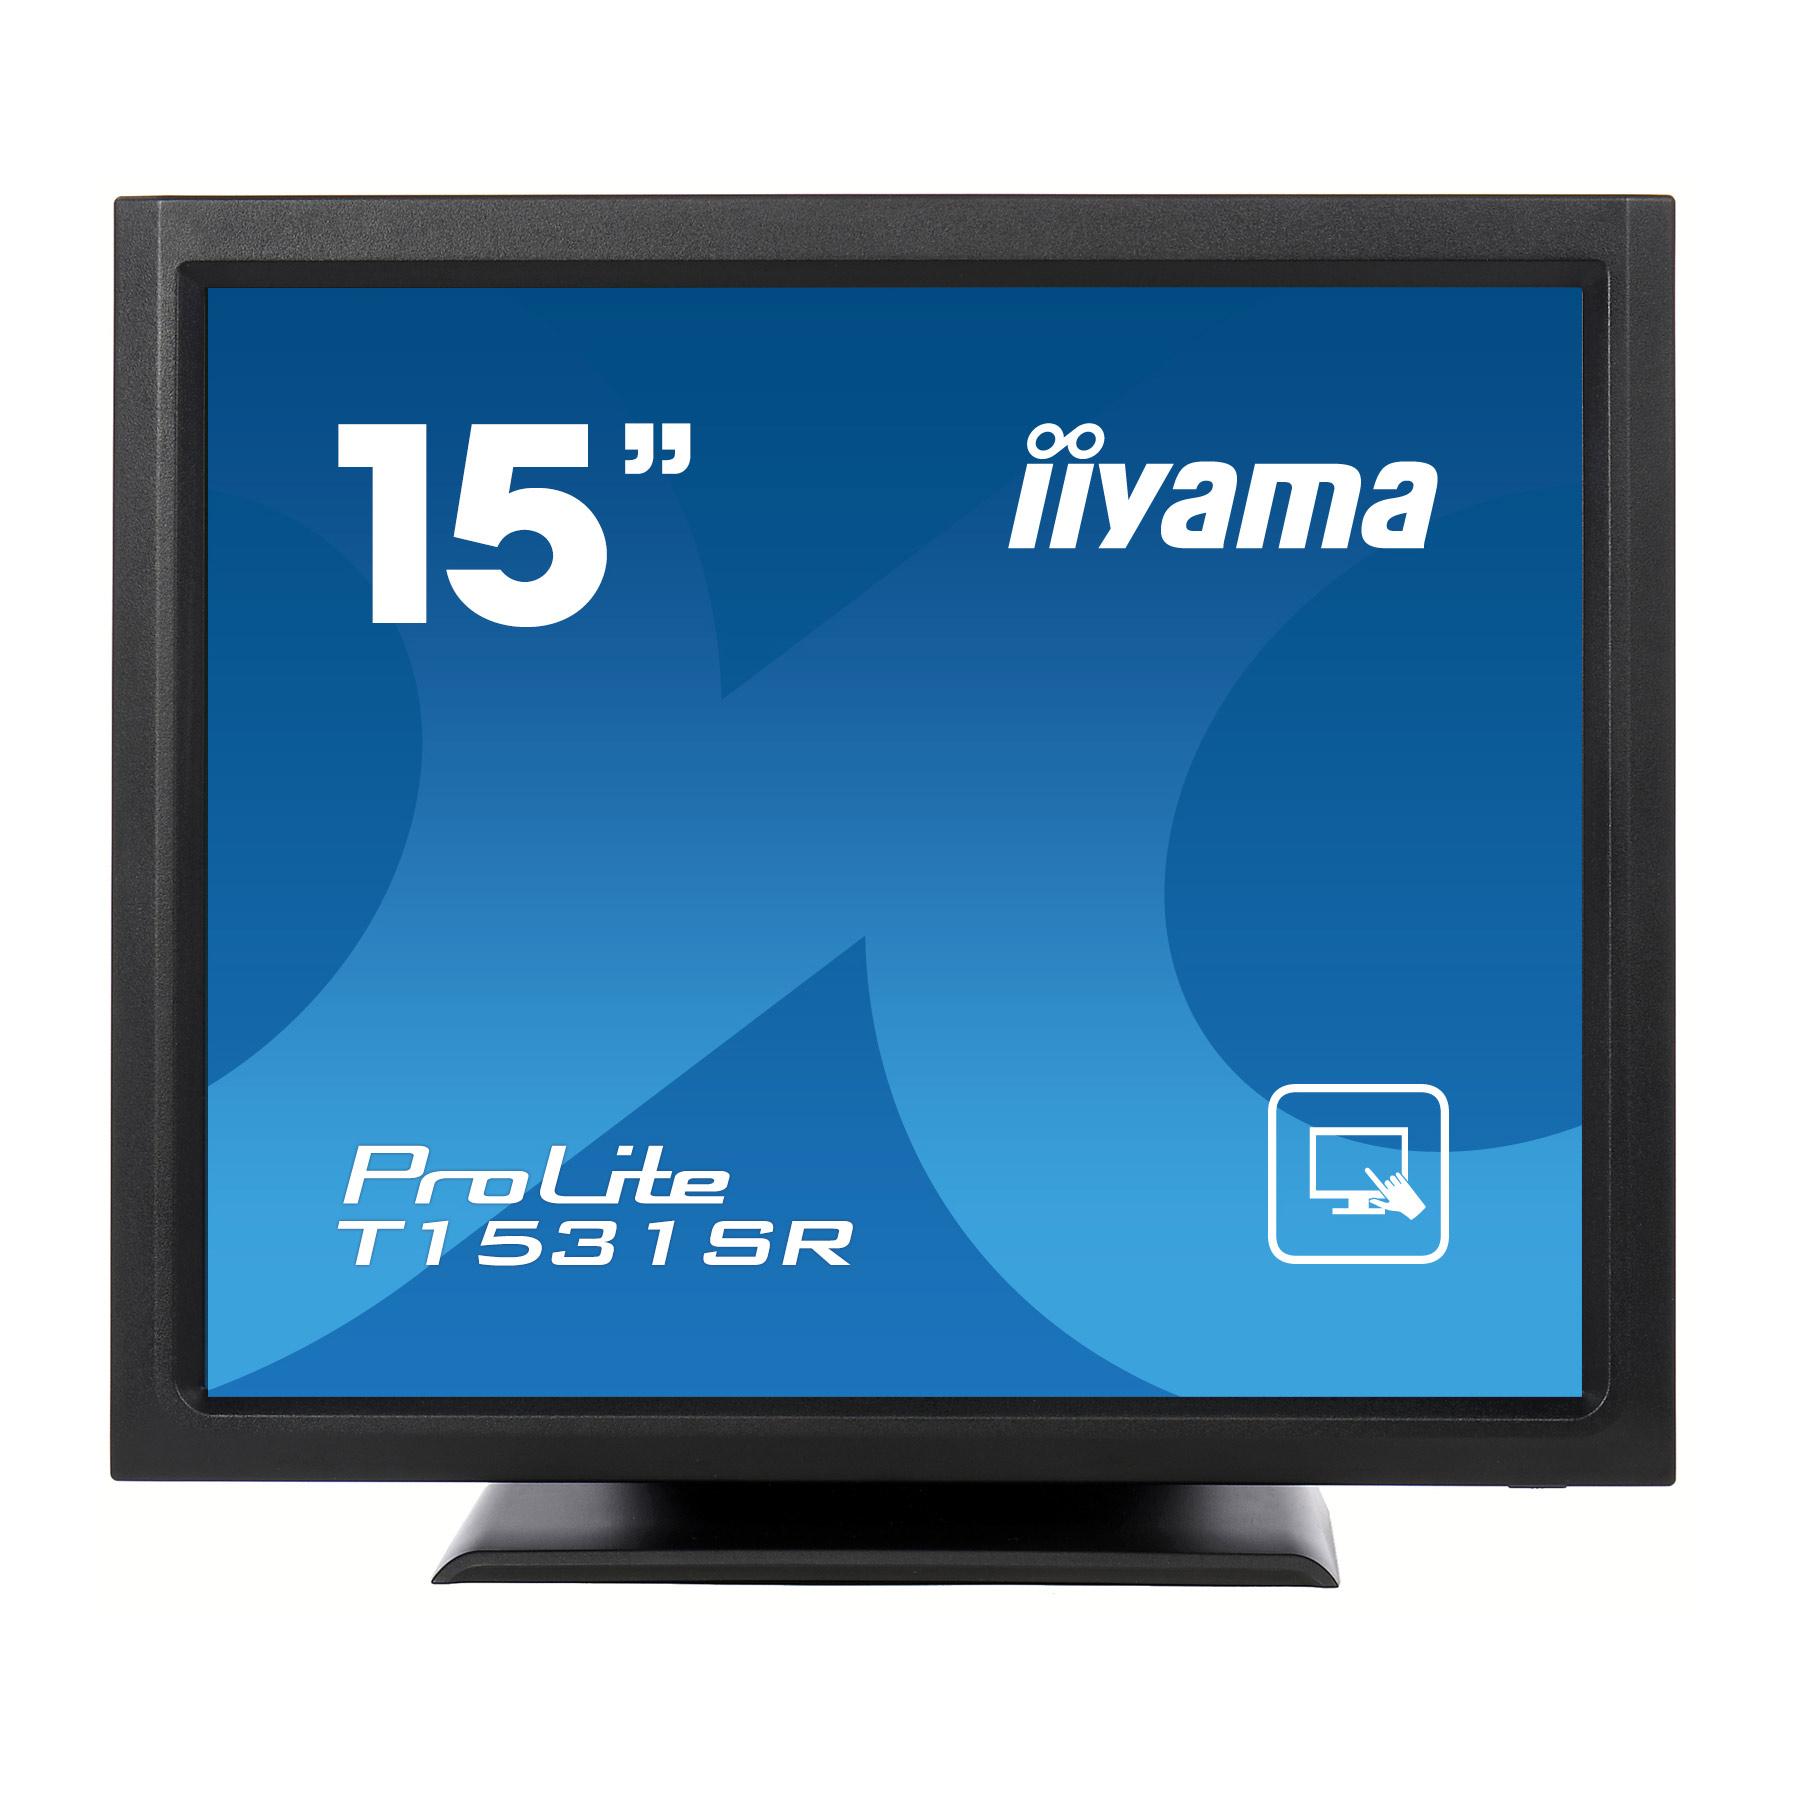 iiyama 15 lcd tactile r sistive prolite t1531sr b3 ecran pc iiyama sur. Black Bedroom Furniture Sets. Home Design Ideas